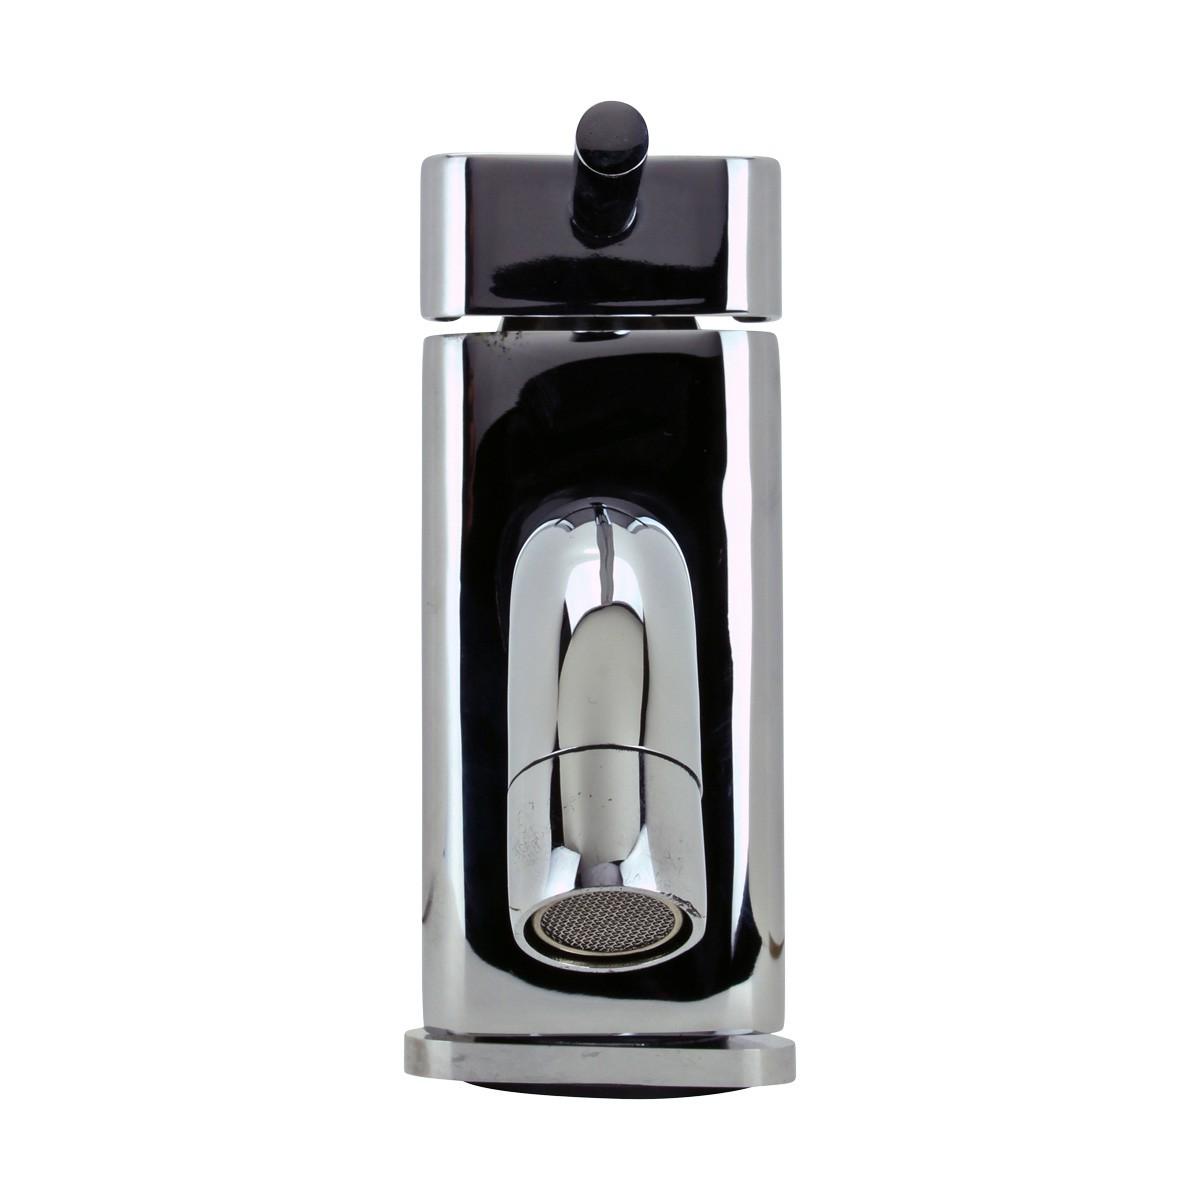 Bathroom Faucet Triangular Chrome 1 Handle Single Hole Faucets Bathroom Faucets Bathroom Sink Faucet